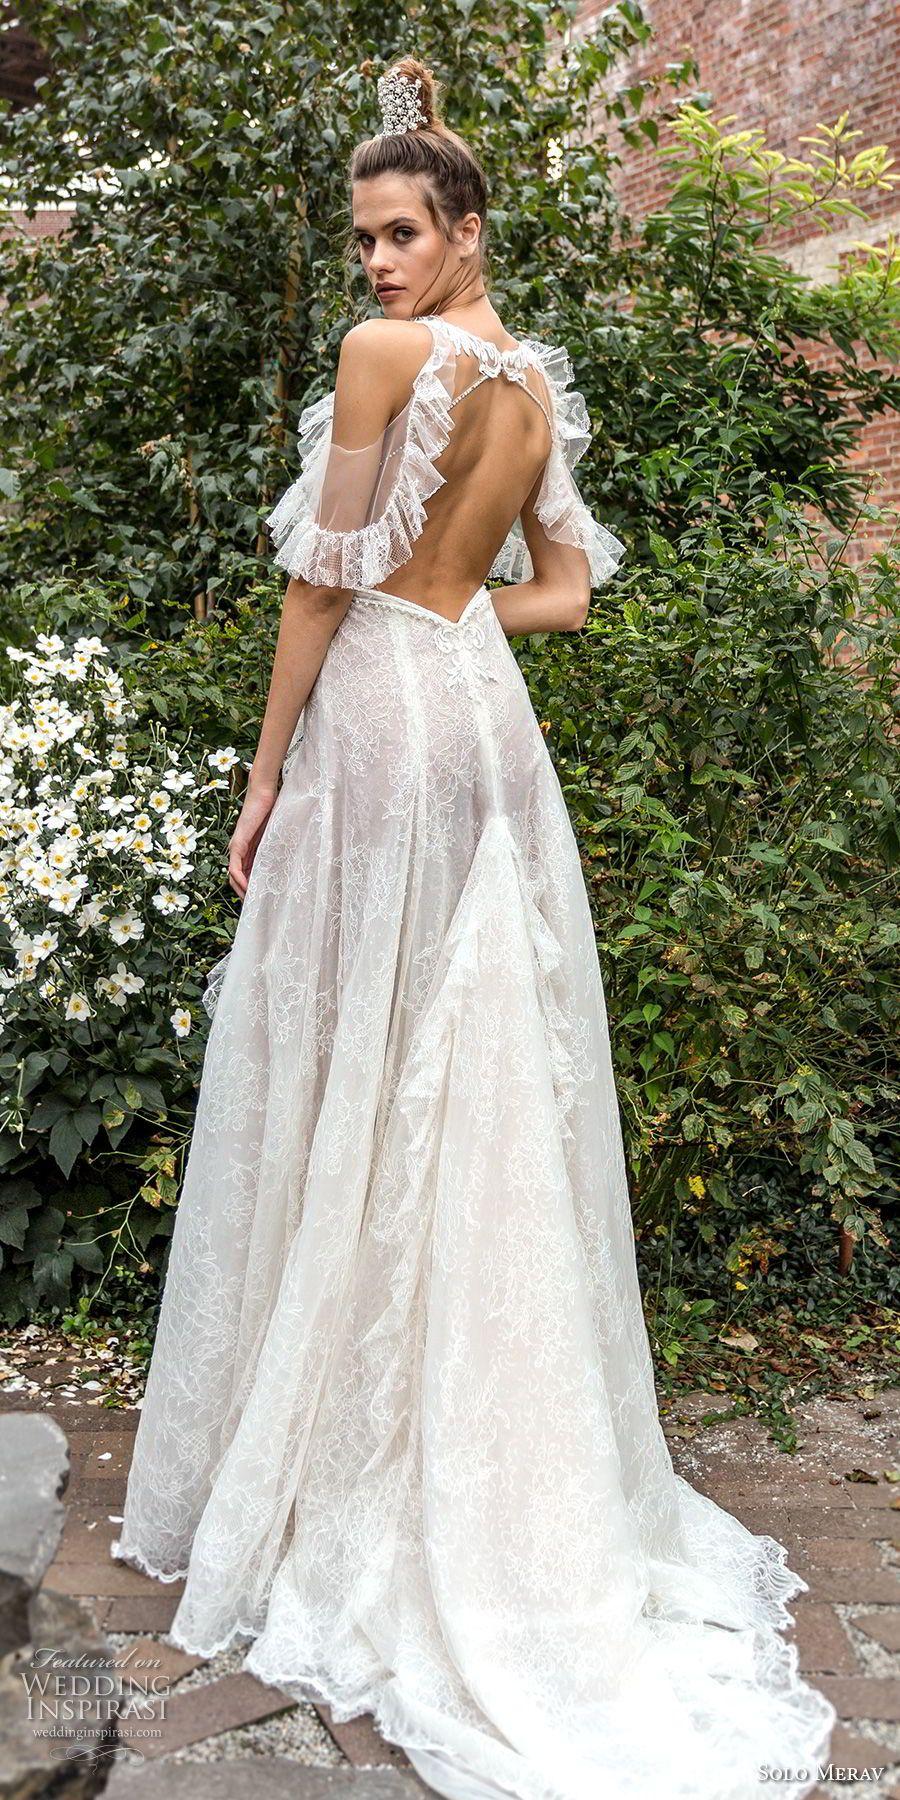 Bridal wedding dresses  Solo Merav  Wedding Dresses u ucWhite Princessud Bridal Collection